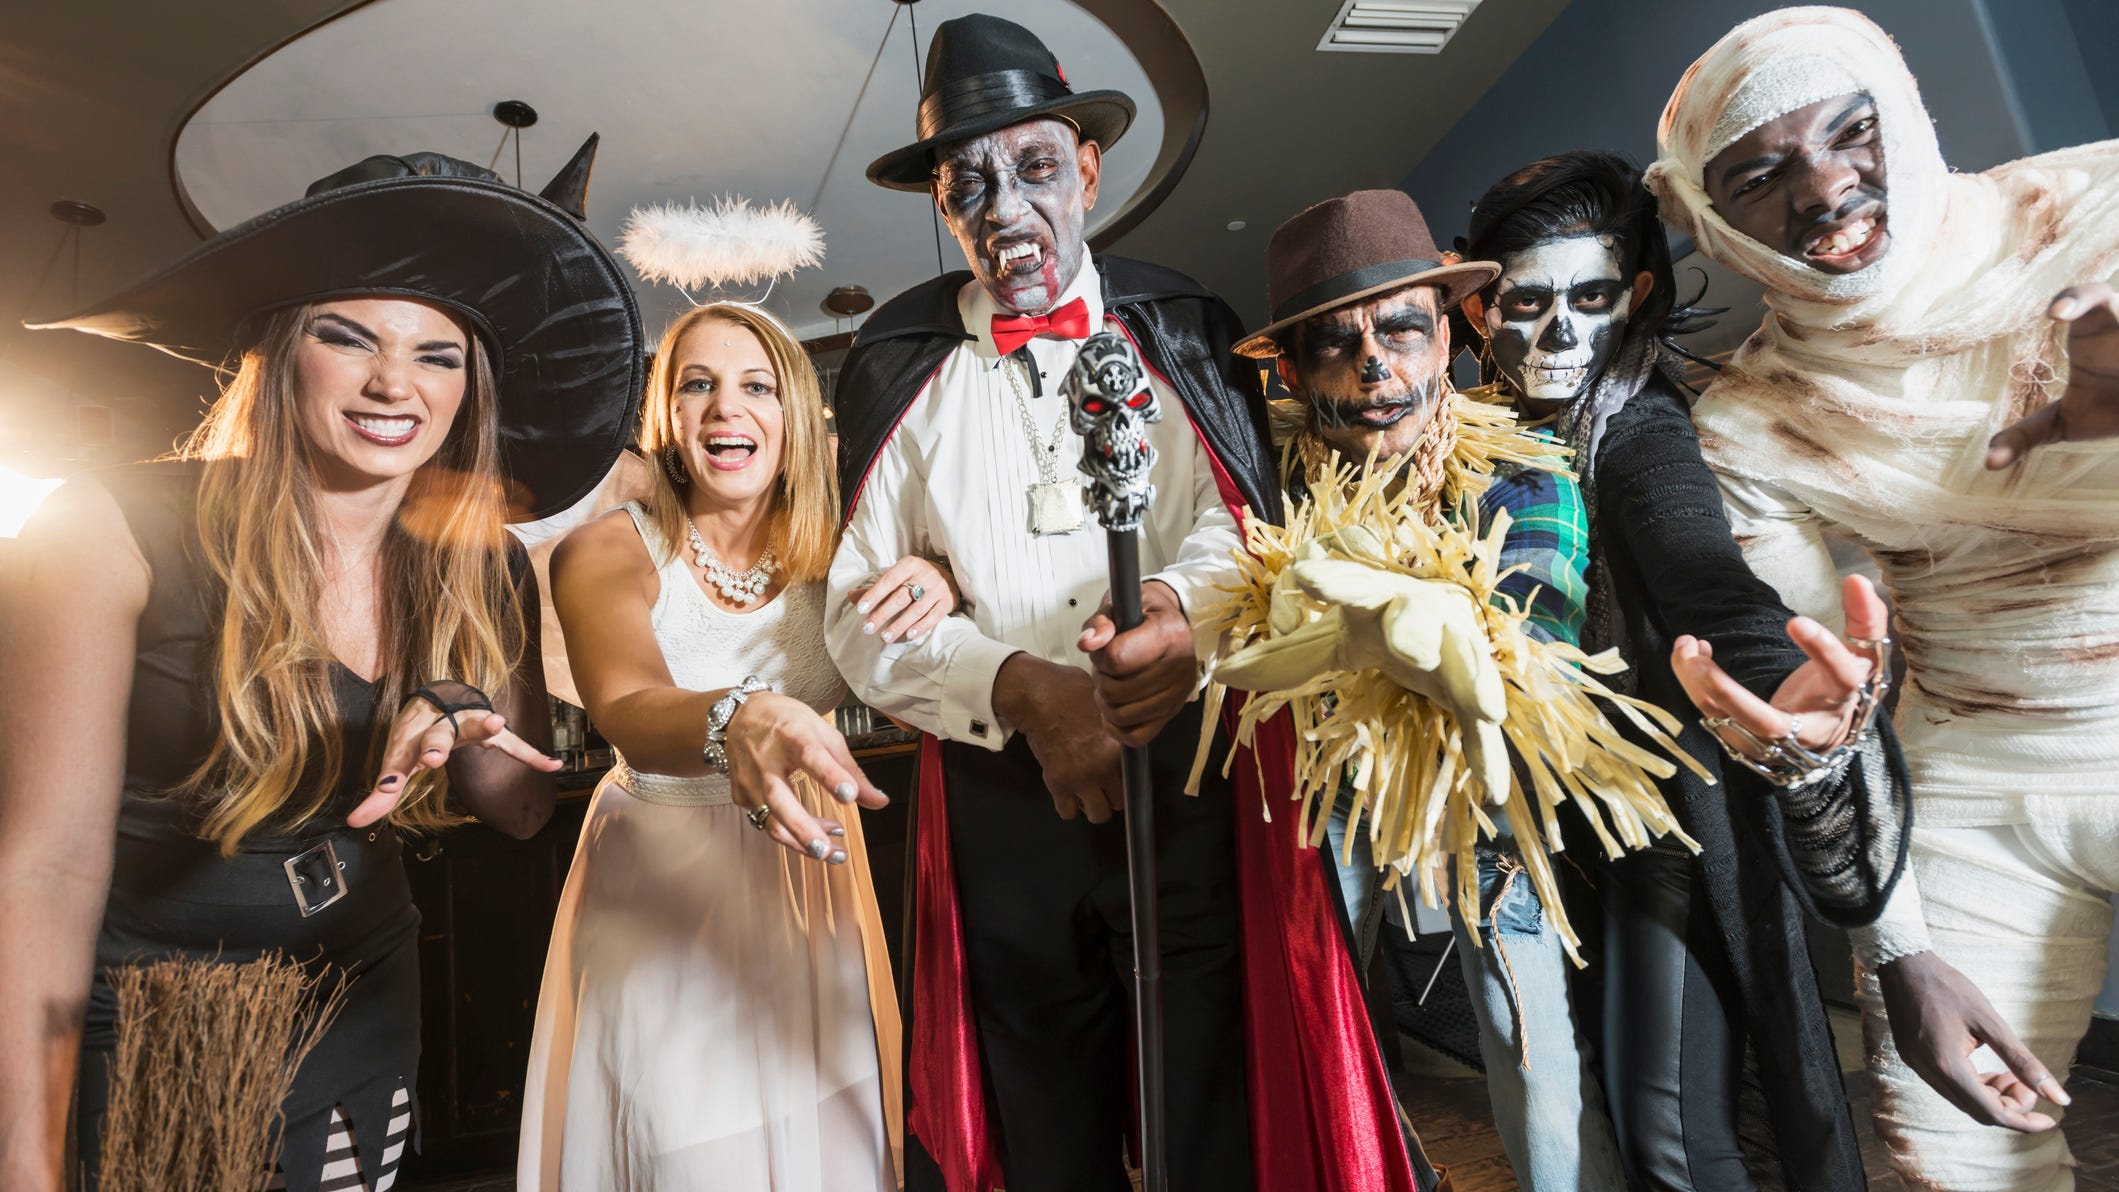 diy halloween costumes: share your photos